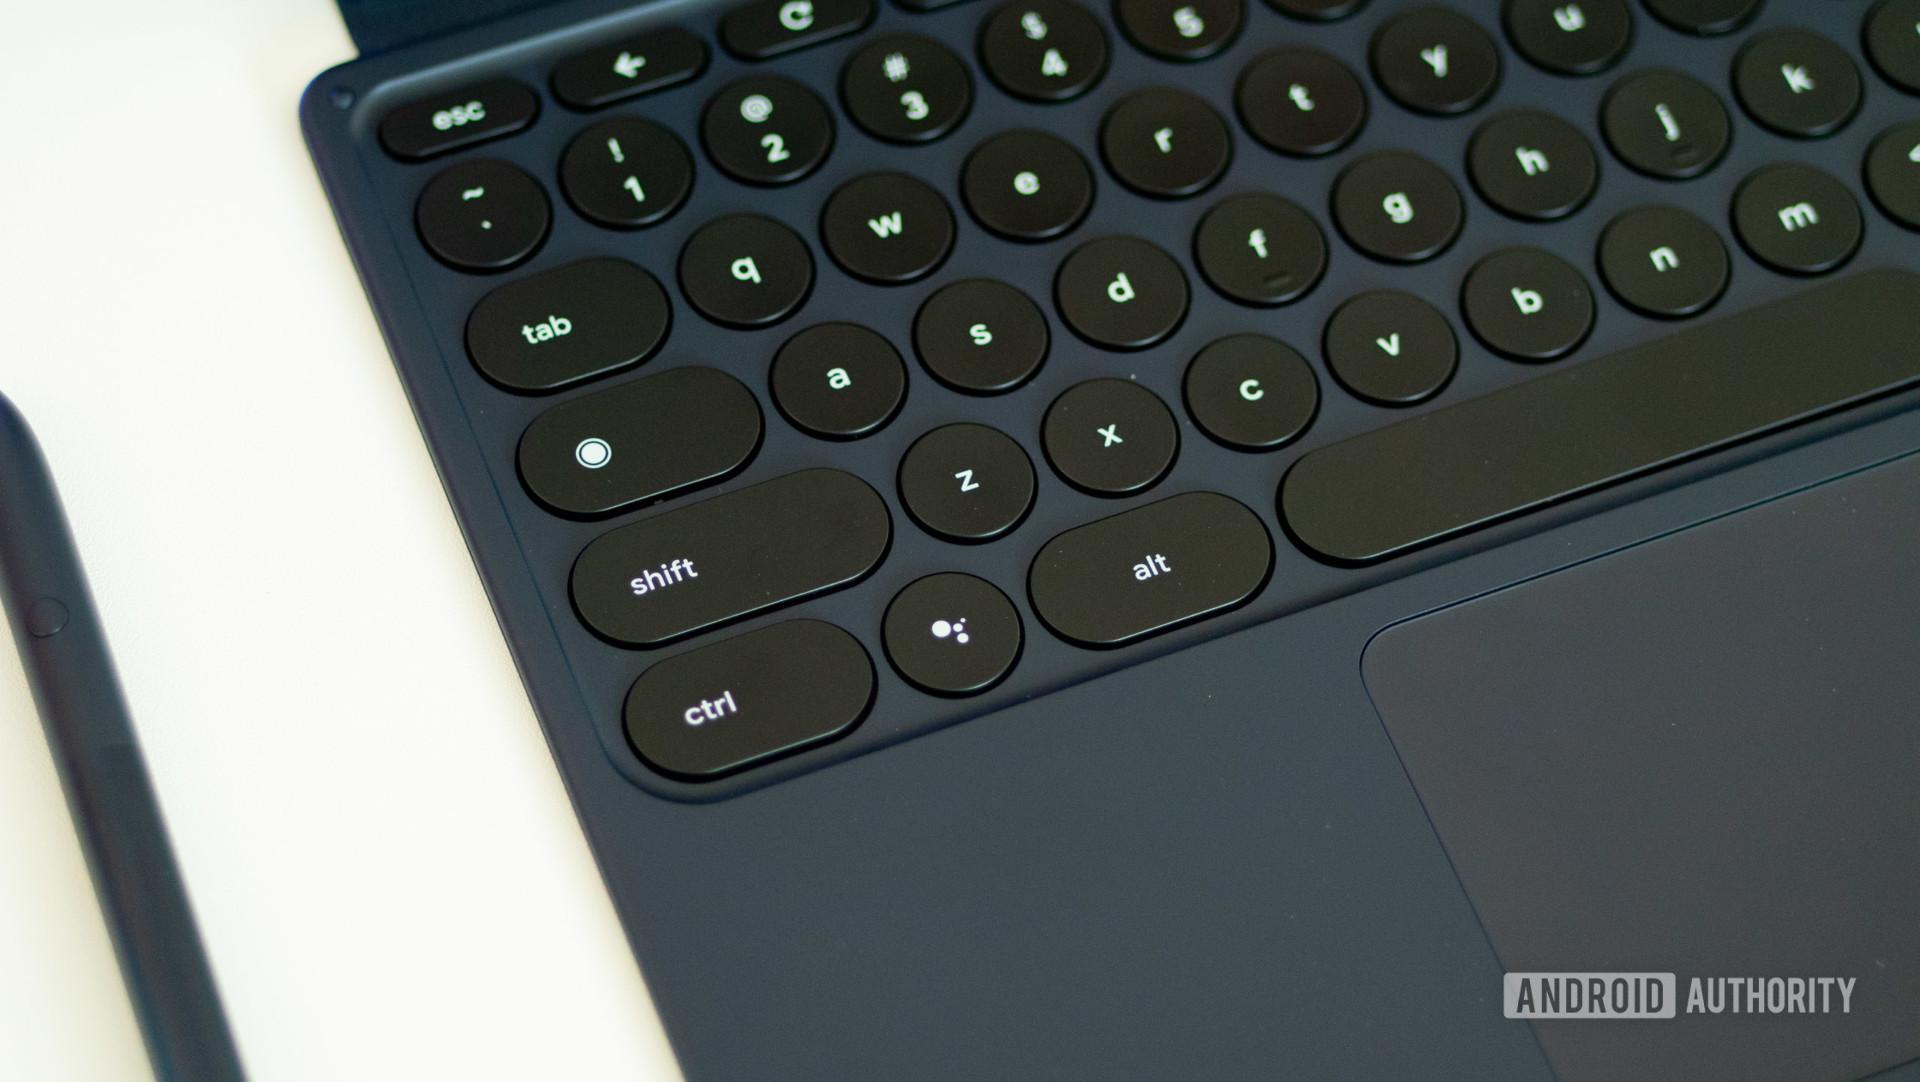 How to turn on Caps Lock on Chromebook.